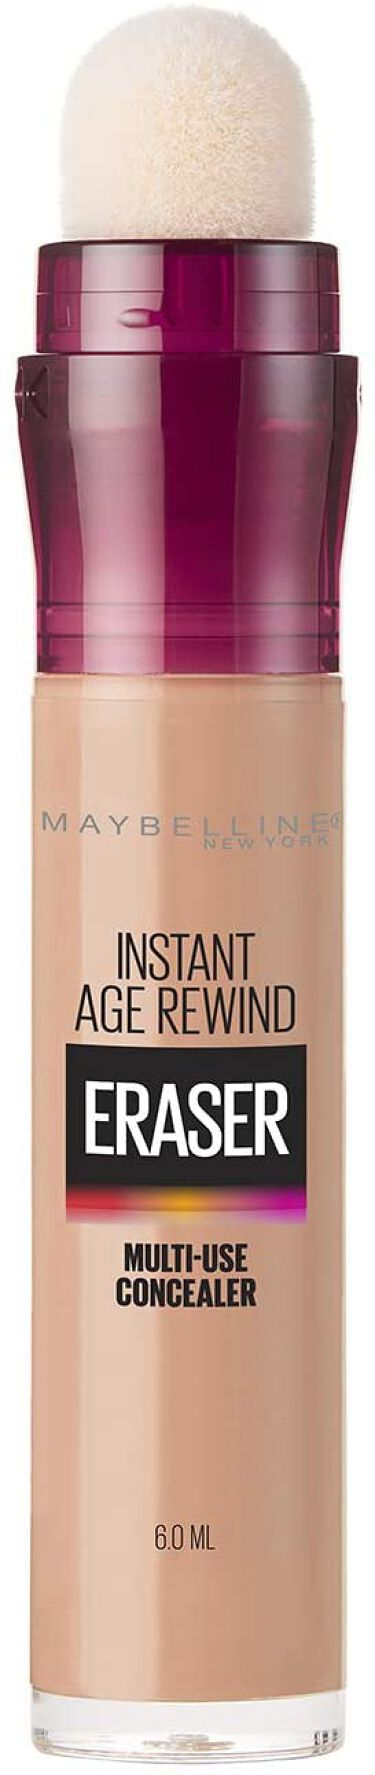 instant age rewind MAYBELLINE NEW YORK